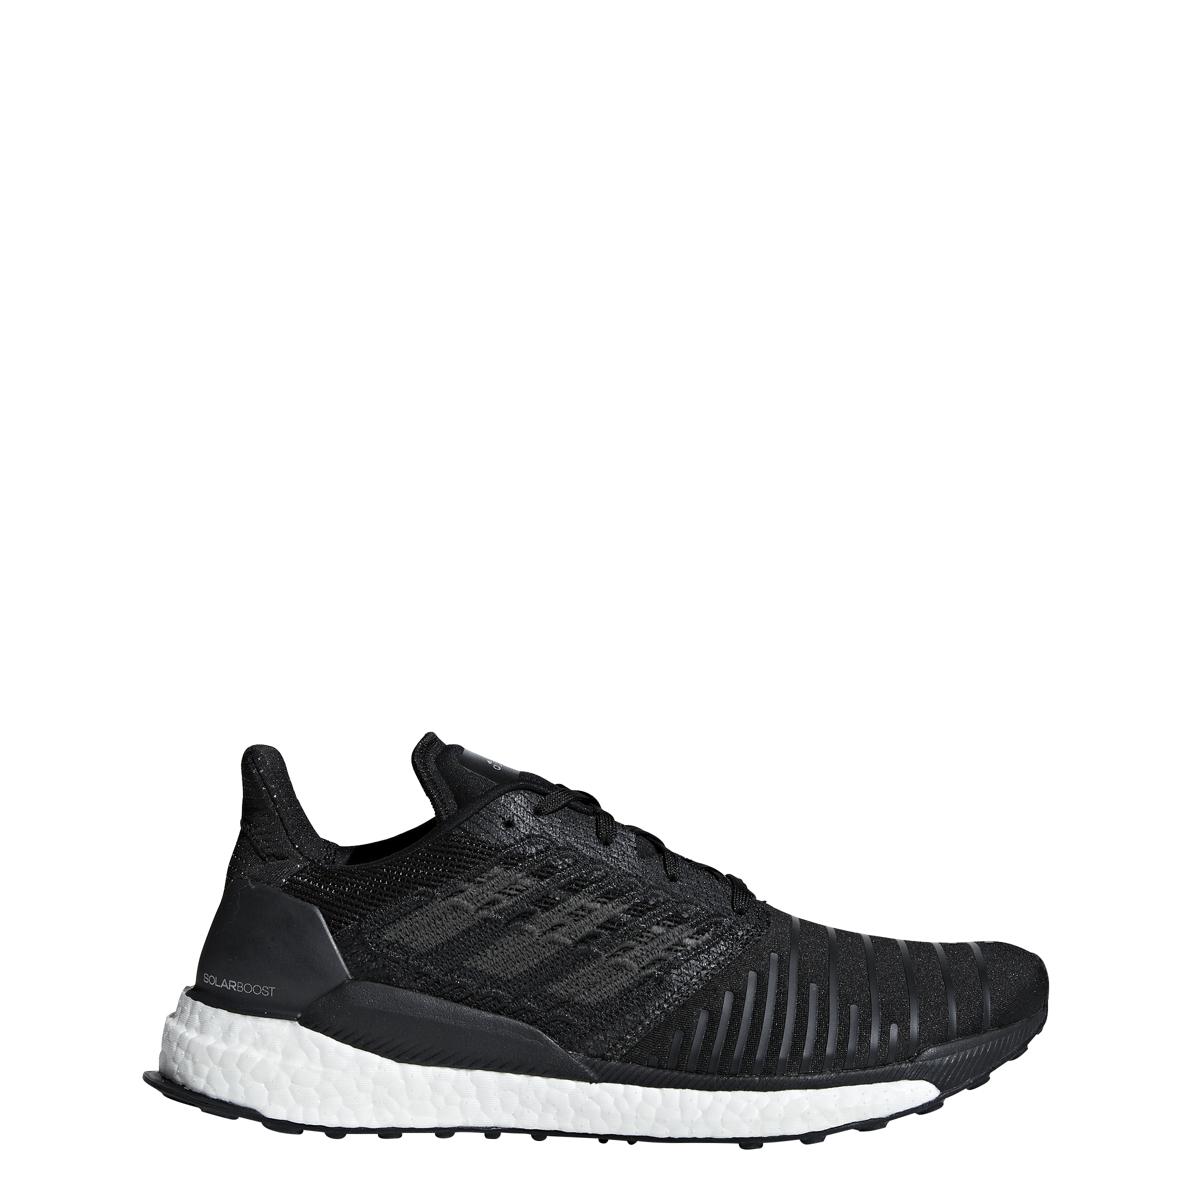 Menos pobre Desmenuzar  Men's Adidas Solar Boost M Running Shoe Black/Grey Four/White | eBay